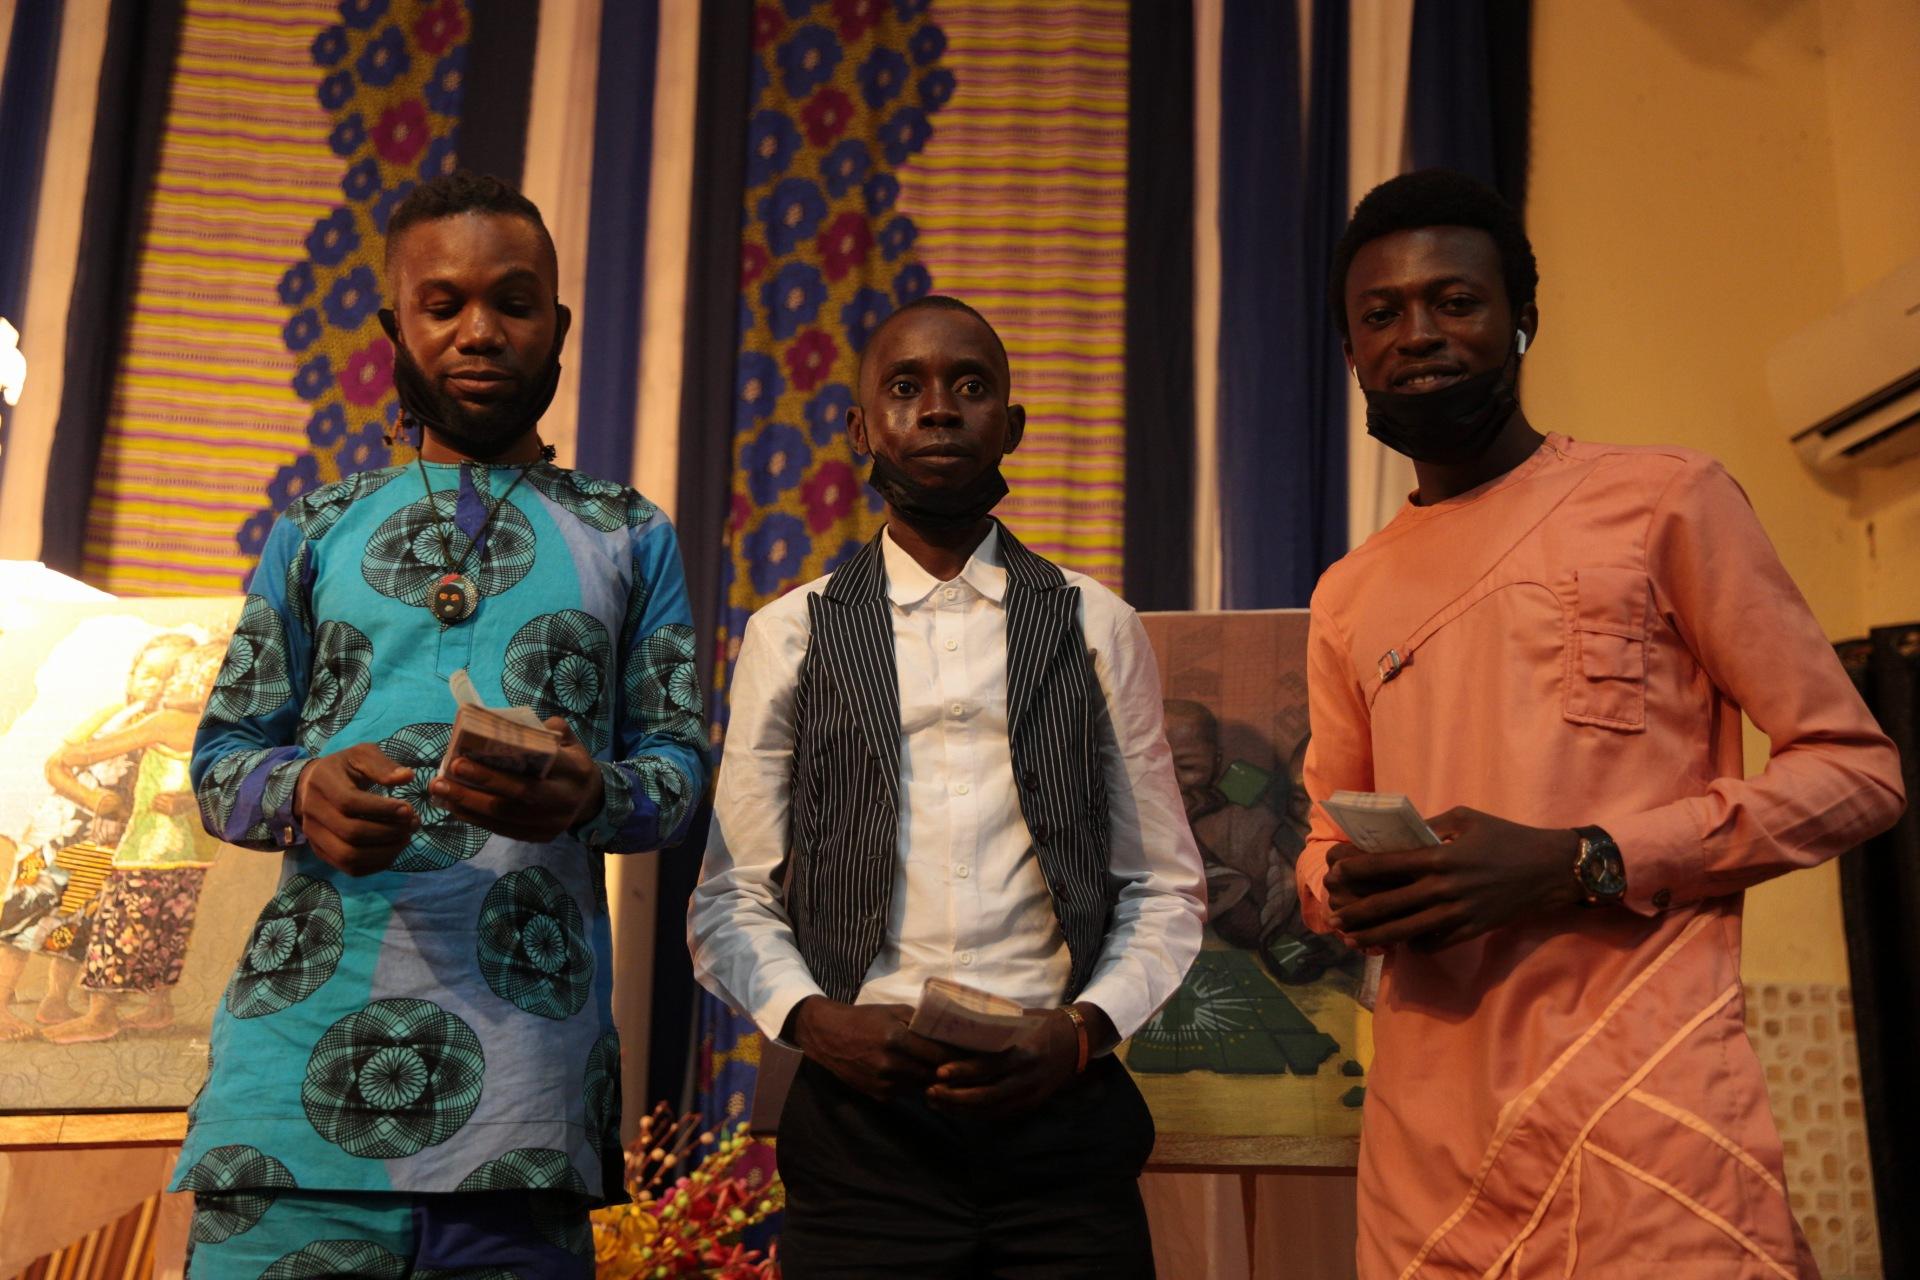 Winners of this year's Felabration artwork competition L-R: Amioleman Emmanuel, Amuta Isitoruka and Eweje Emmanuel.